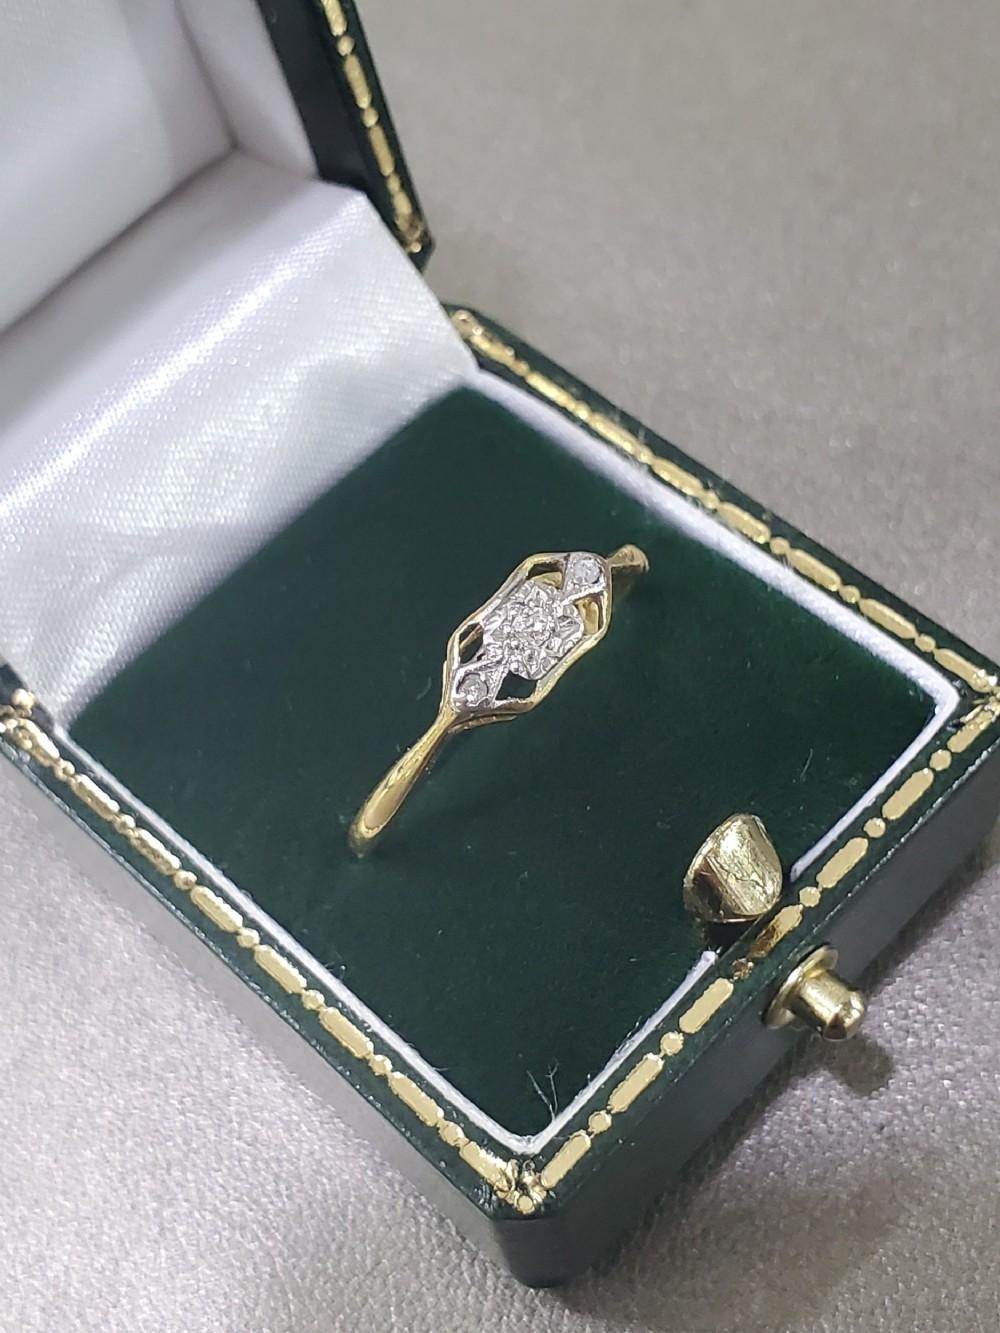 art deco platinum set 3 diamond open ring on 18ct gold band ring size o12